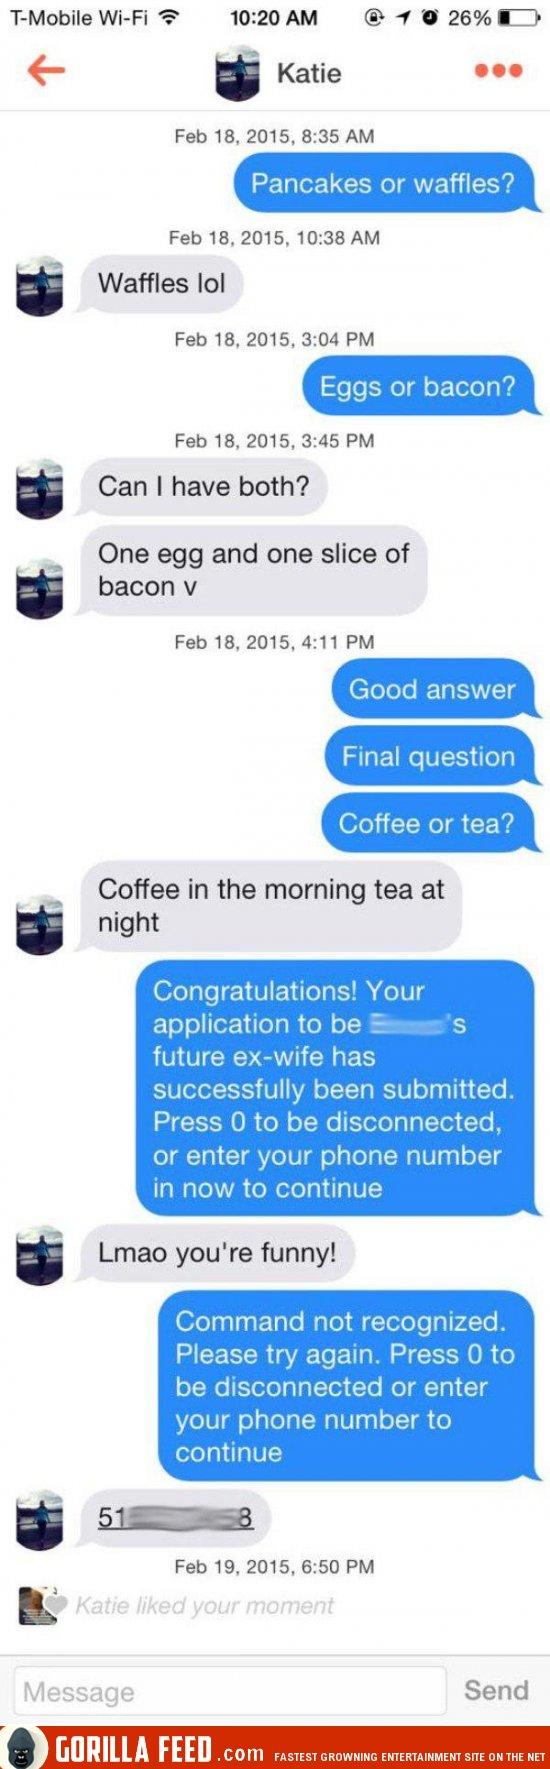 One genius man has created the Tinder cheat code (12